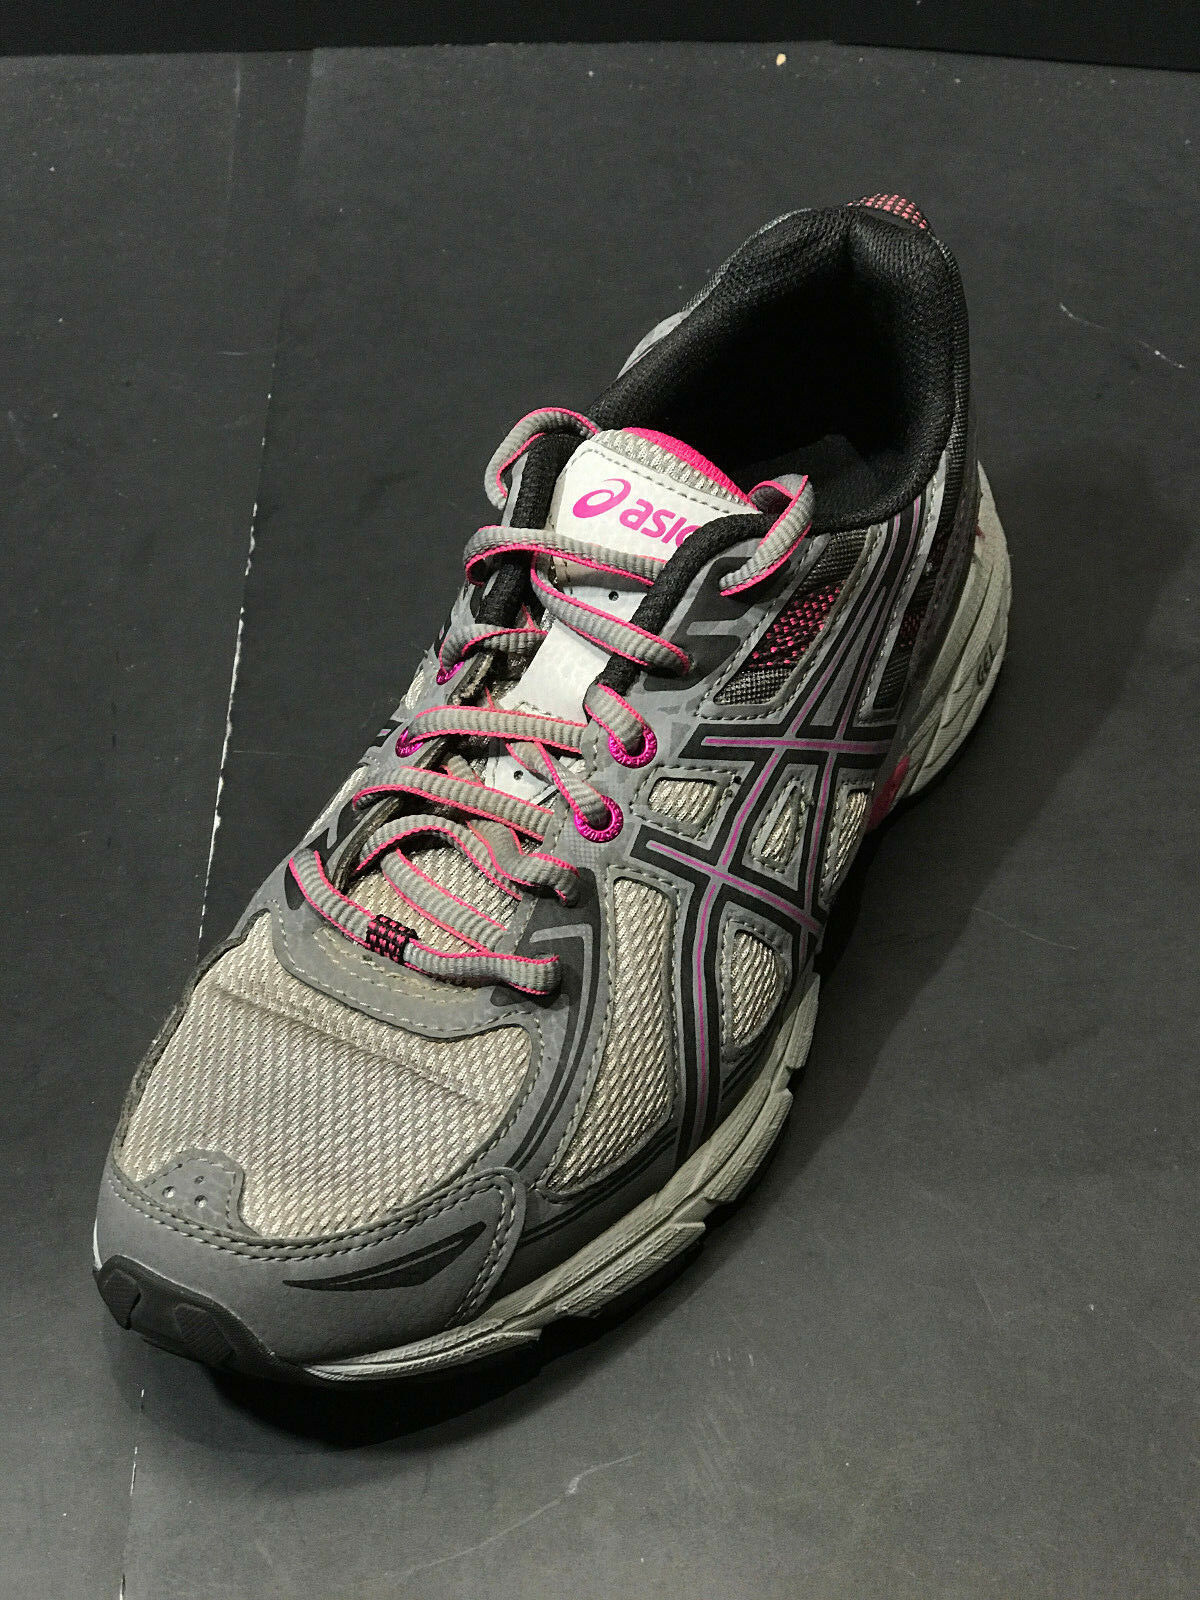 Asics Women's Gel-Venture 6 Trail Running shoes Carbon Black Pink Size US 9.5 M